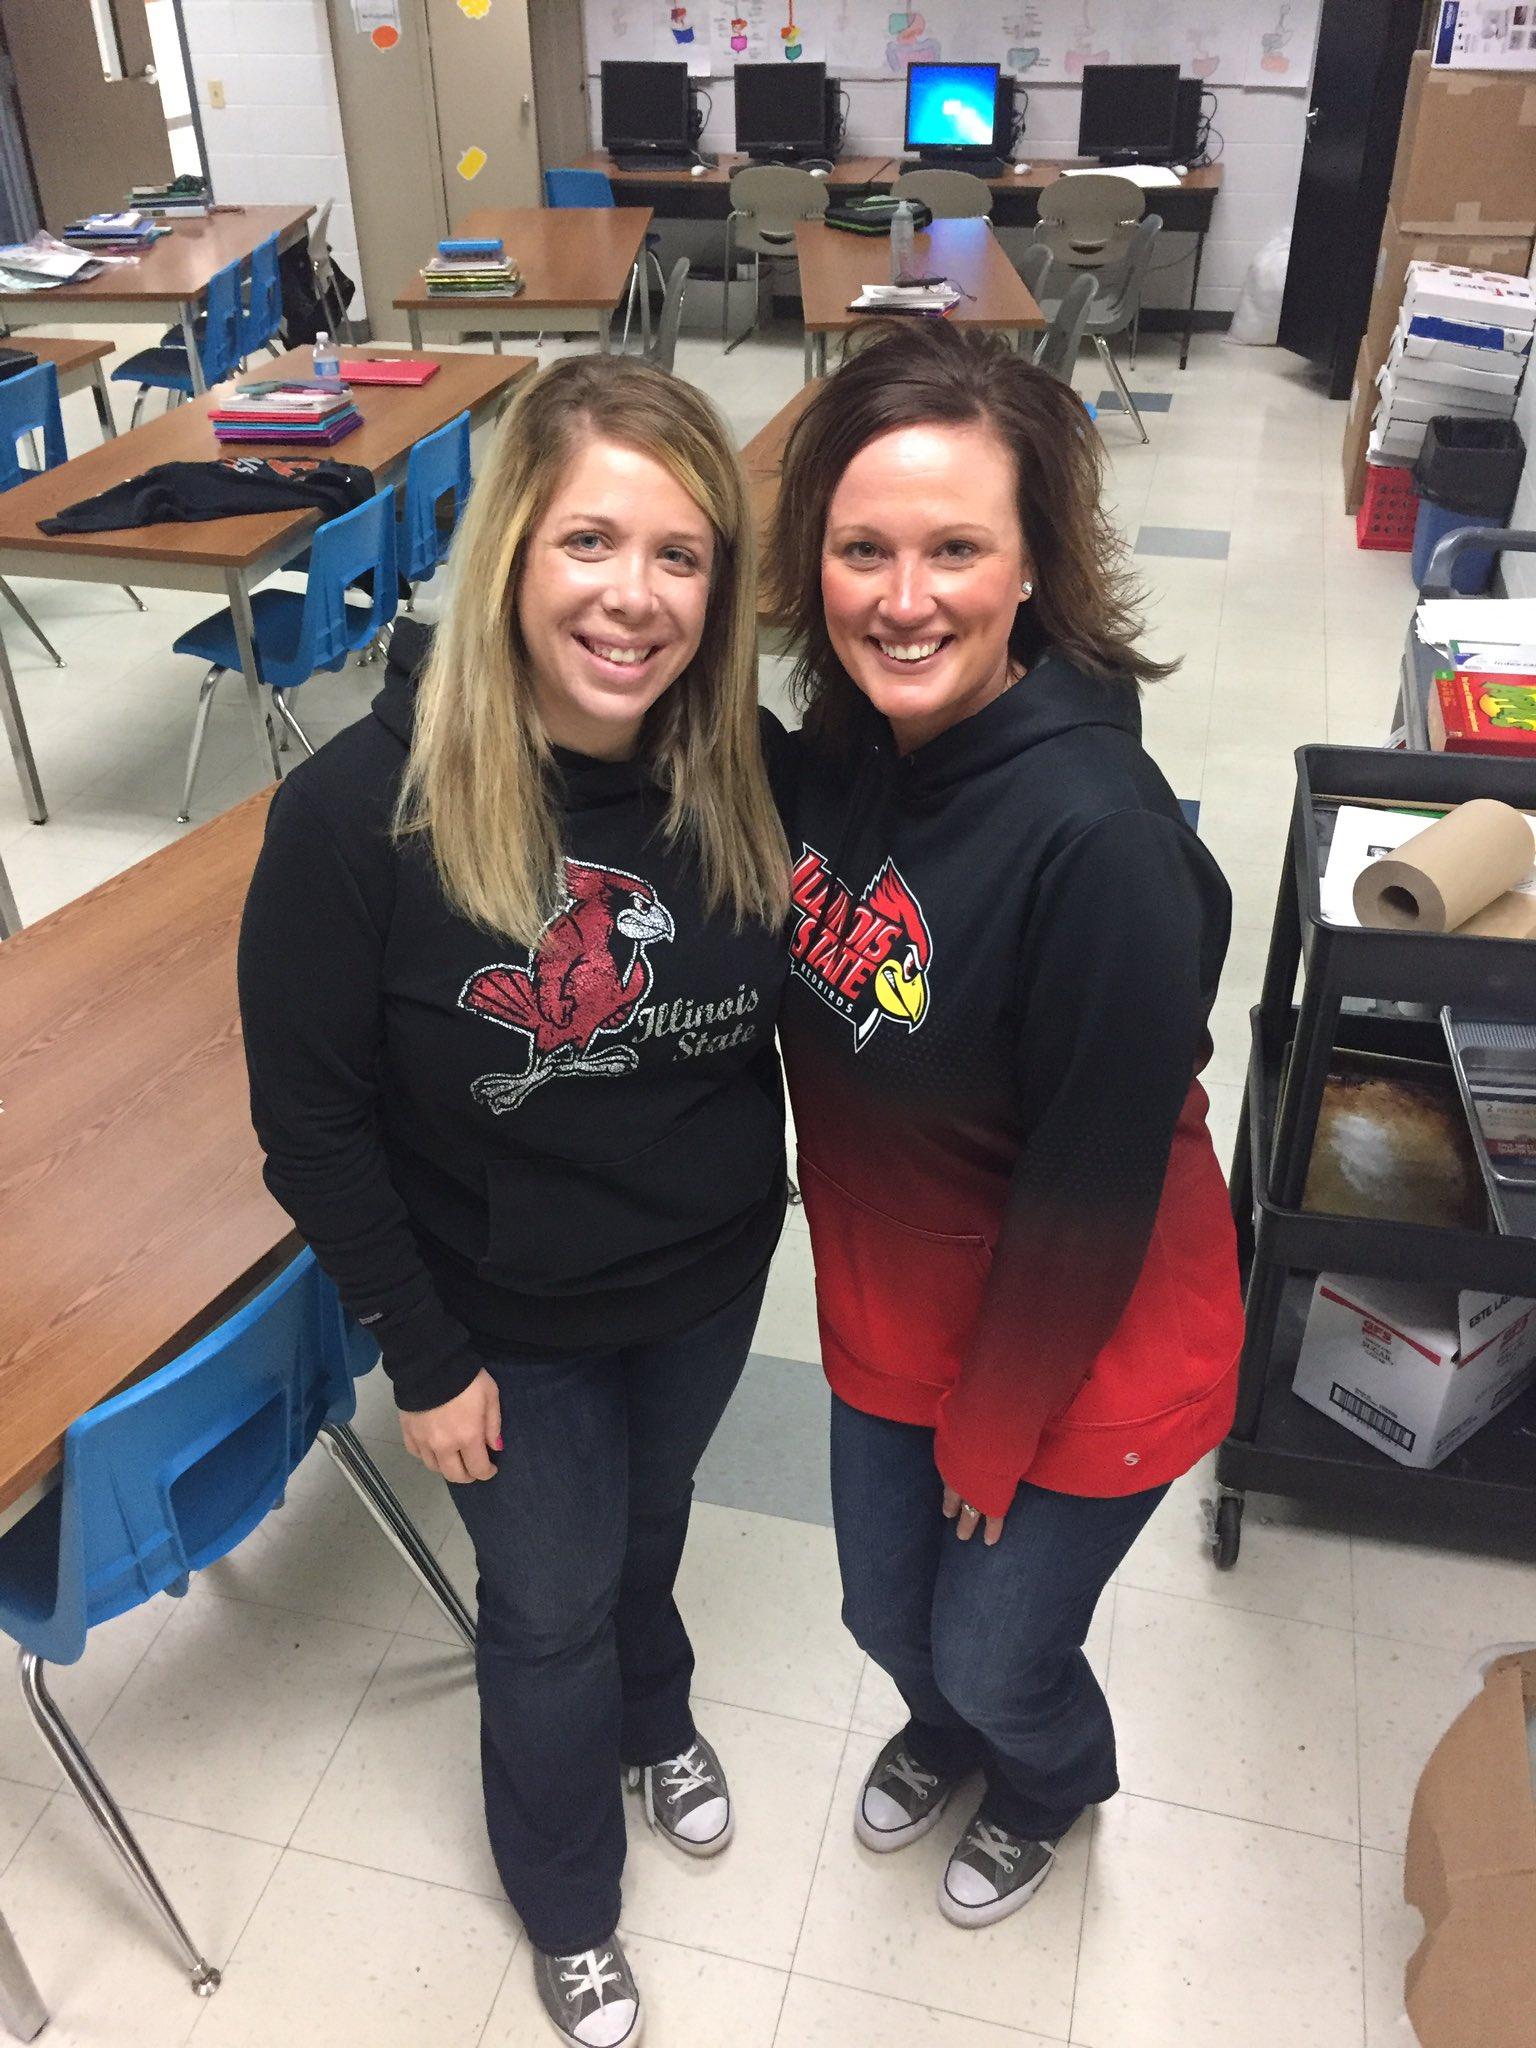 #RedBirdsetgo Mrs. T & Mrs. E proud ISU Alum working at Winnebago High School in Winnebago, IL. #gladlyweteach&learn ❤️ ISU day! https://t.co/mKIeIk9noi